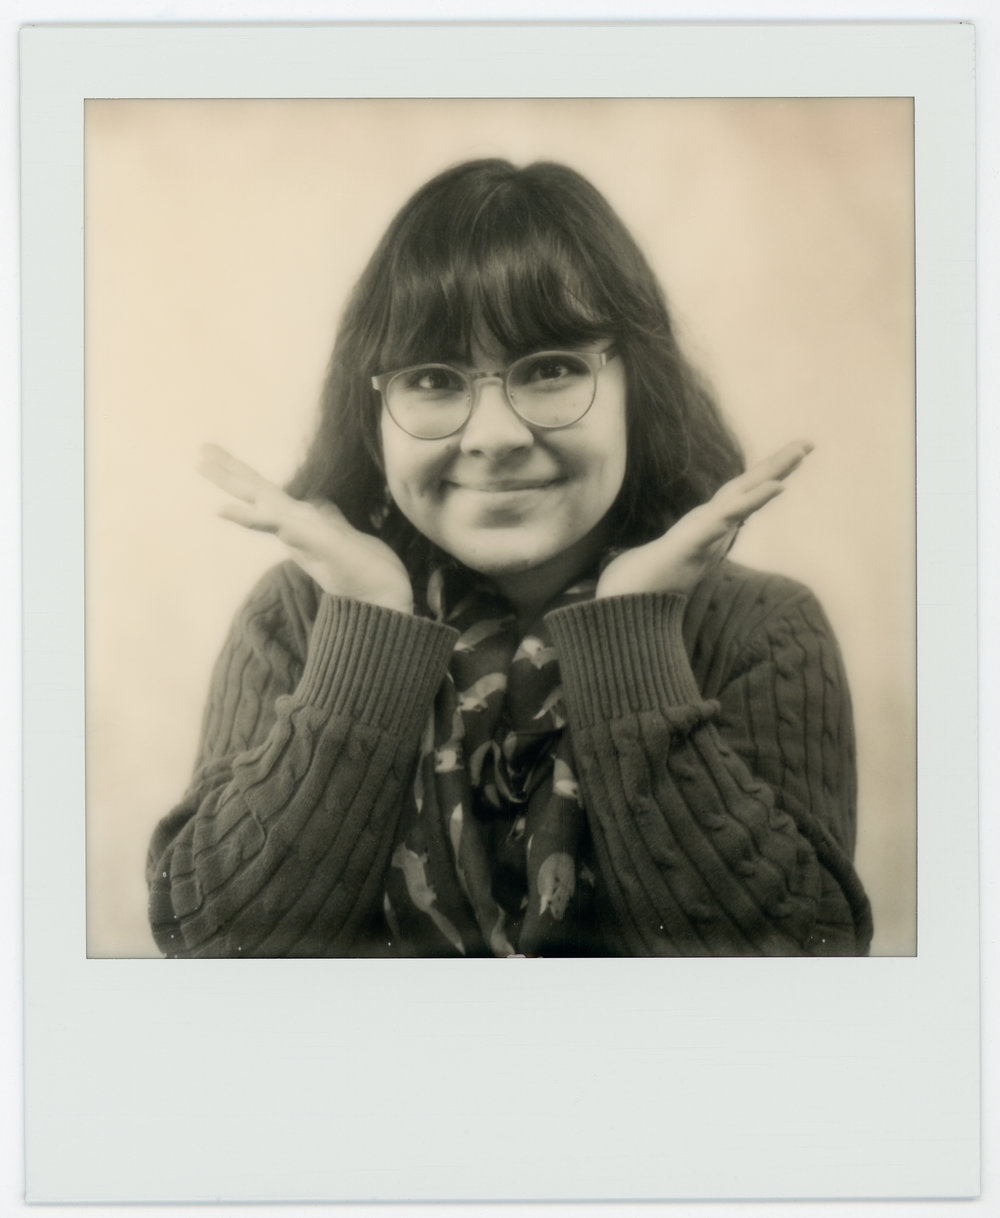 Indira Estrada